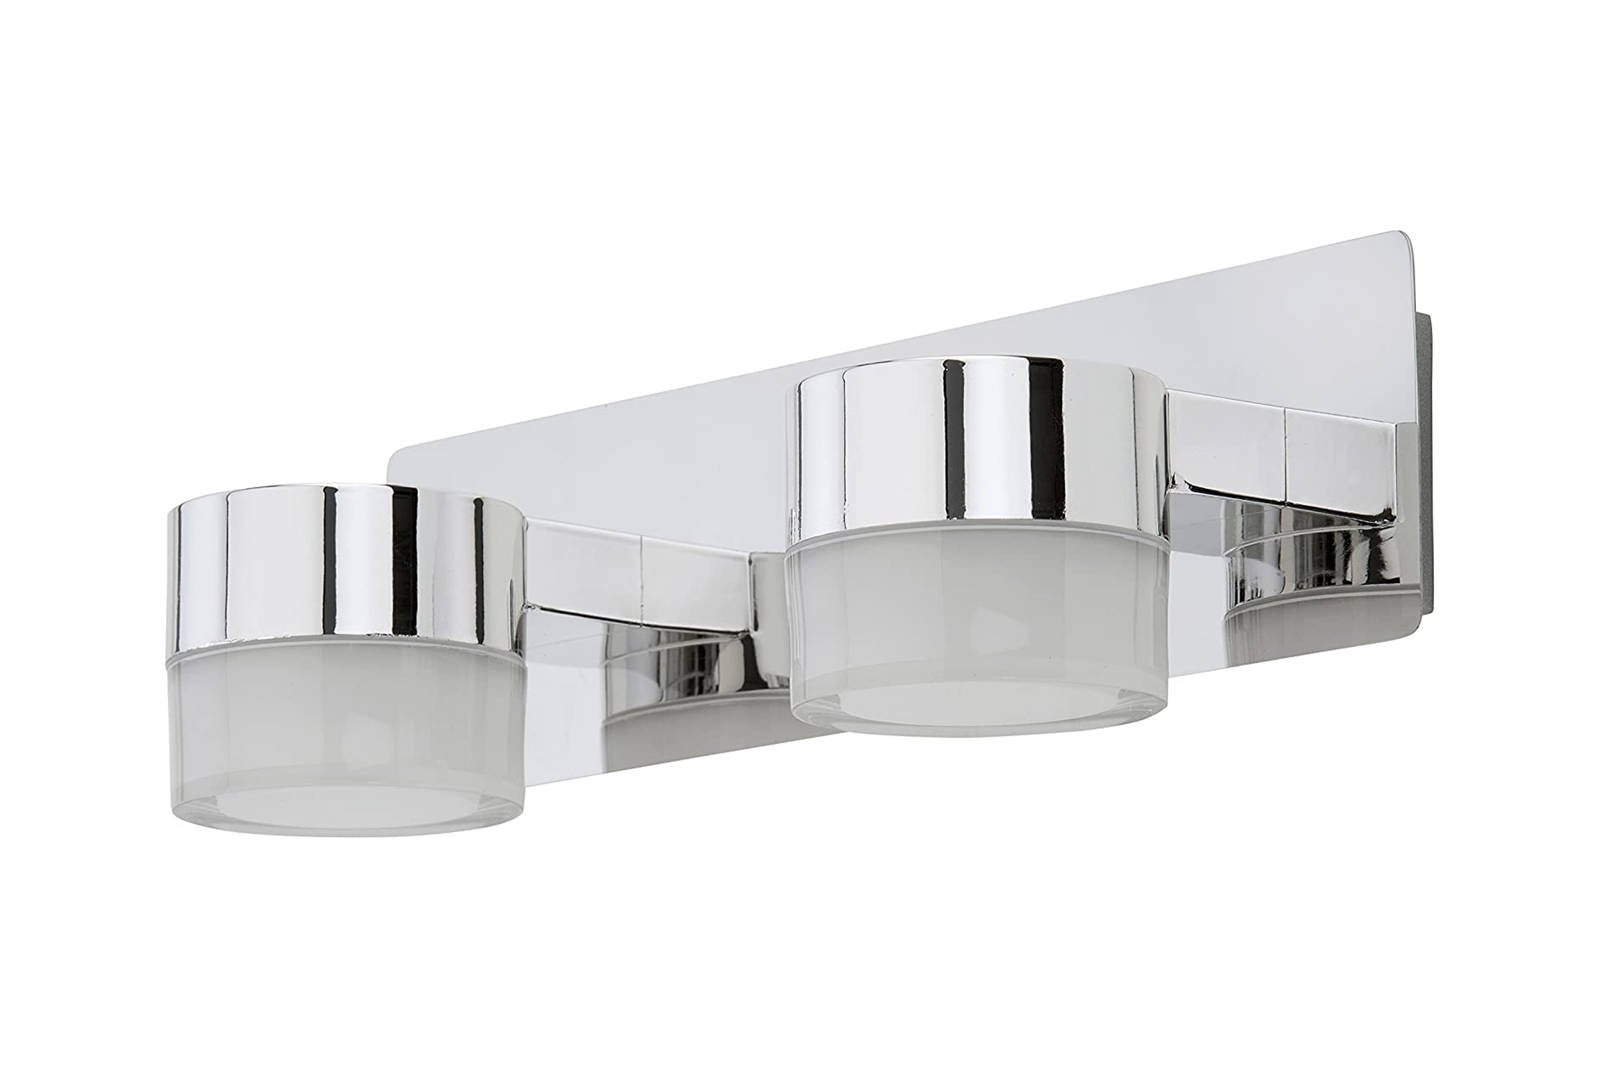 Bath mirror lamp Surf Briloner 2247-028